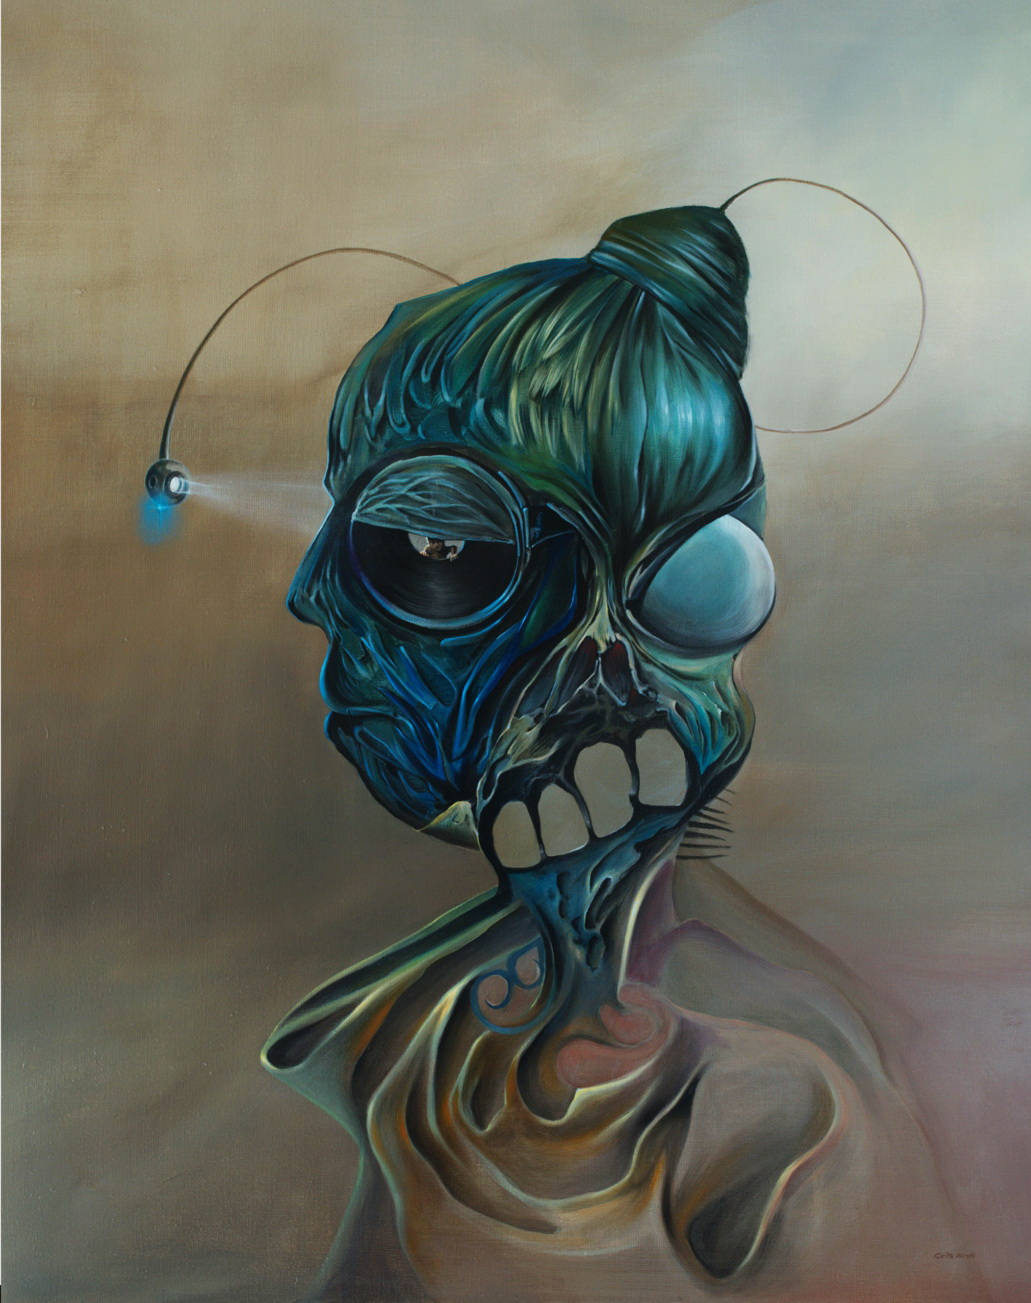 ART_paint_Nie_uciekniesz_01